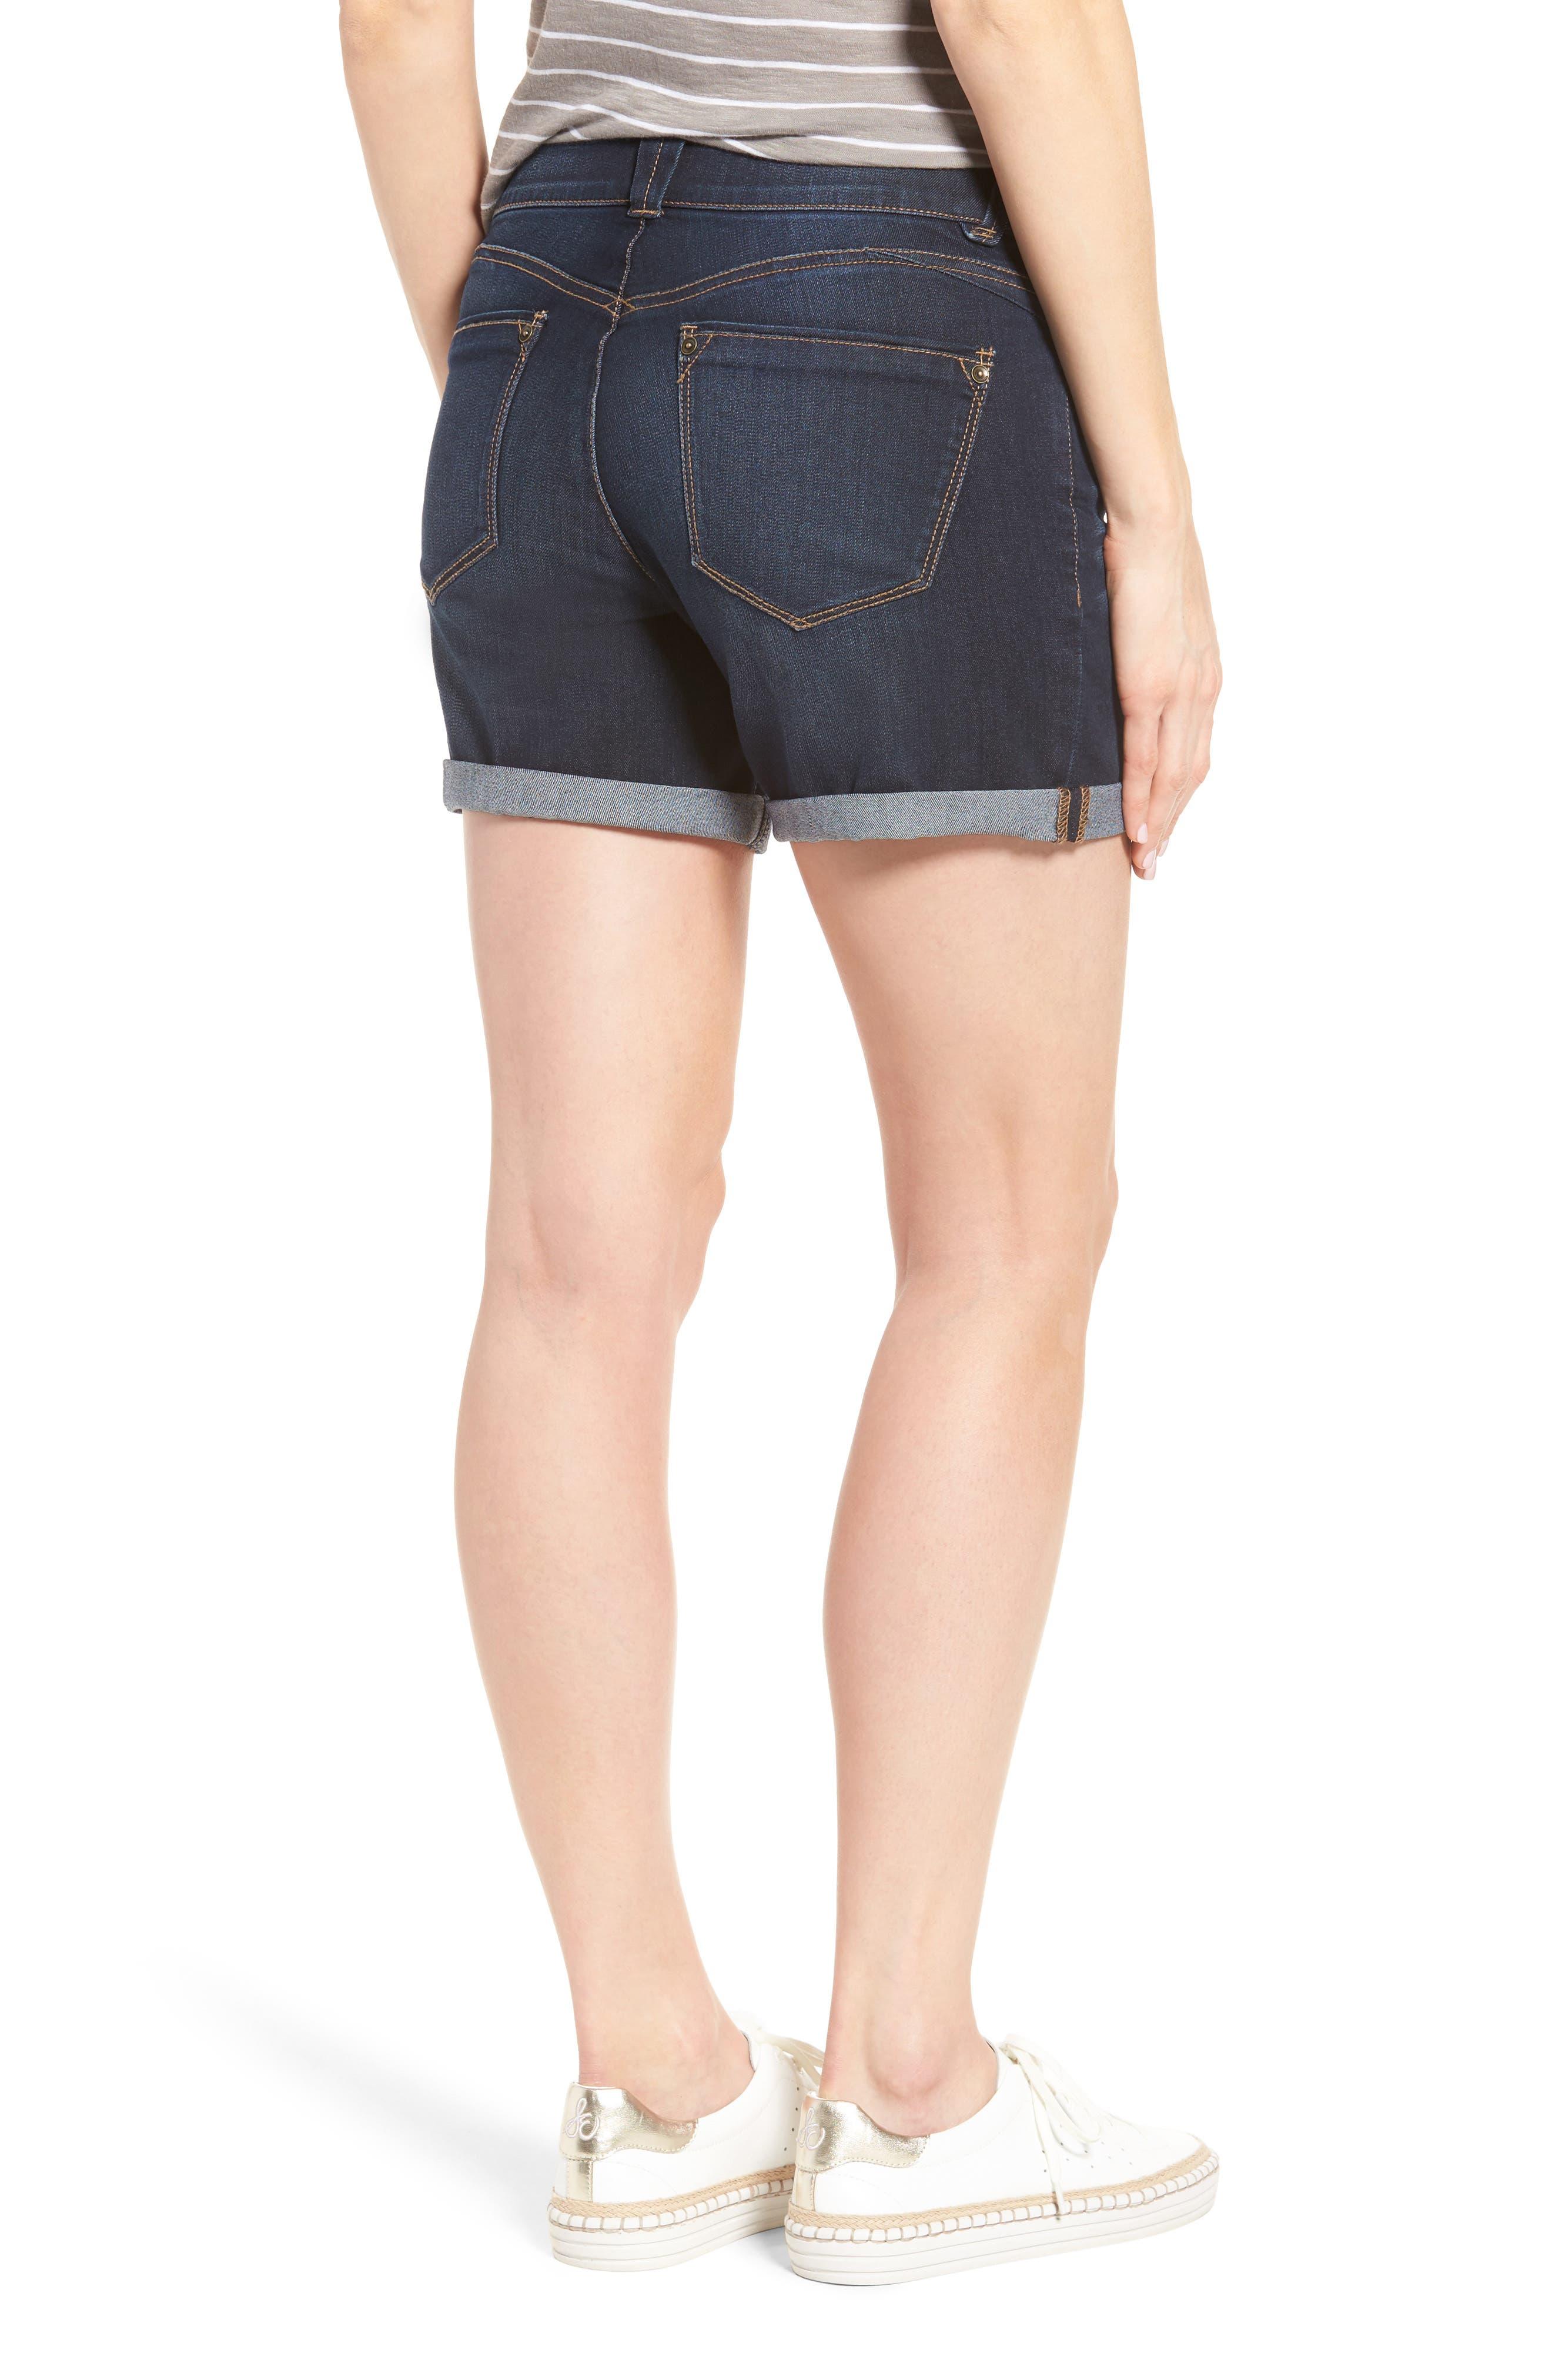 Ab-solution Cuffed Denim Shorts,                             Alternate thumbnail 2, color,                             Indigo